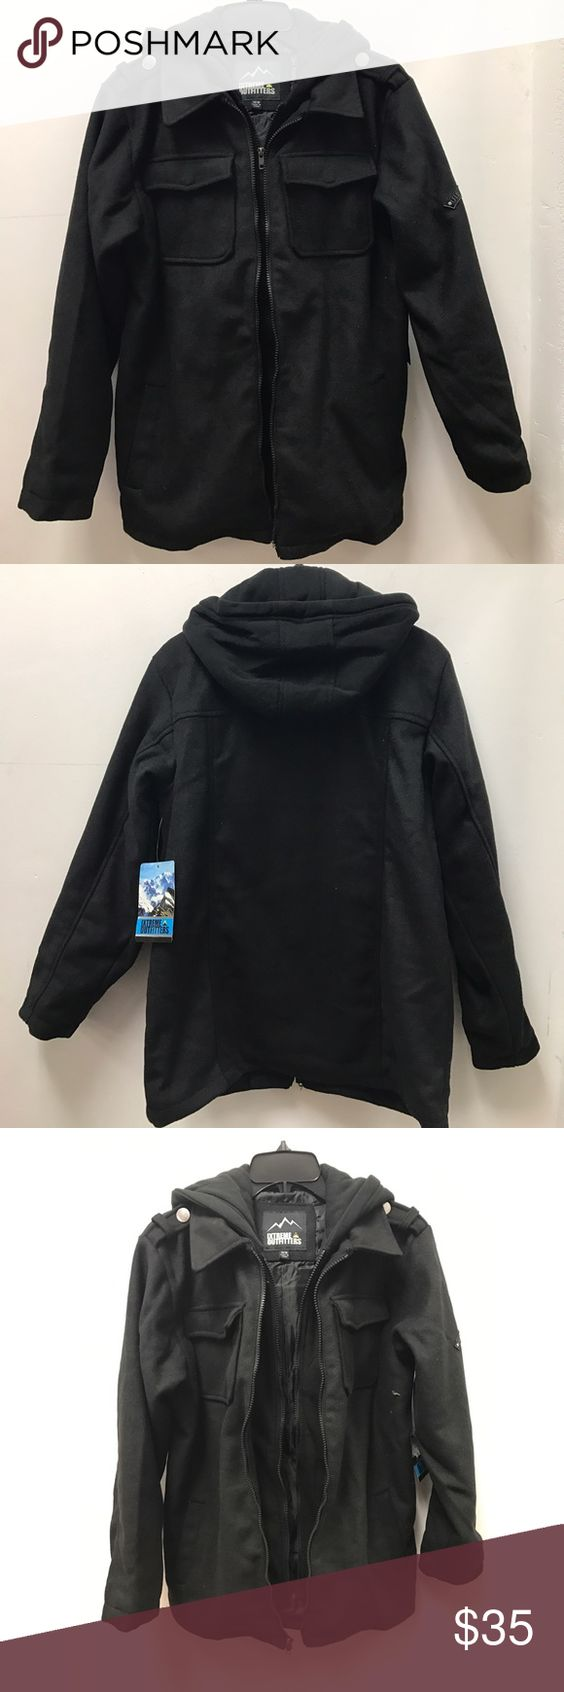 Military Utility Coat/Jacket Boutique   Pinterest   Coats D and Warm